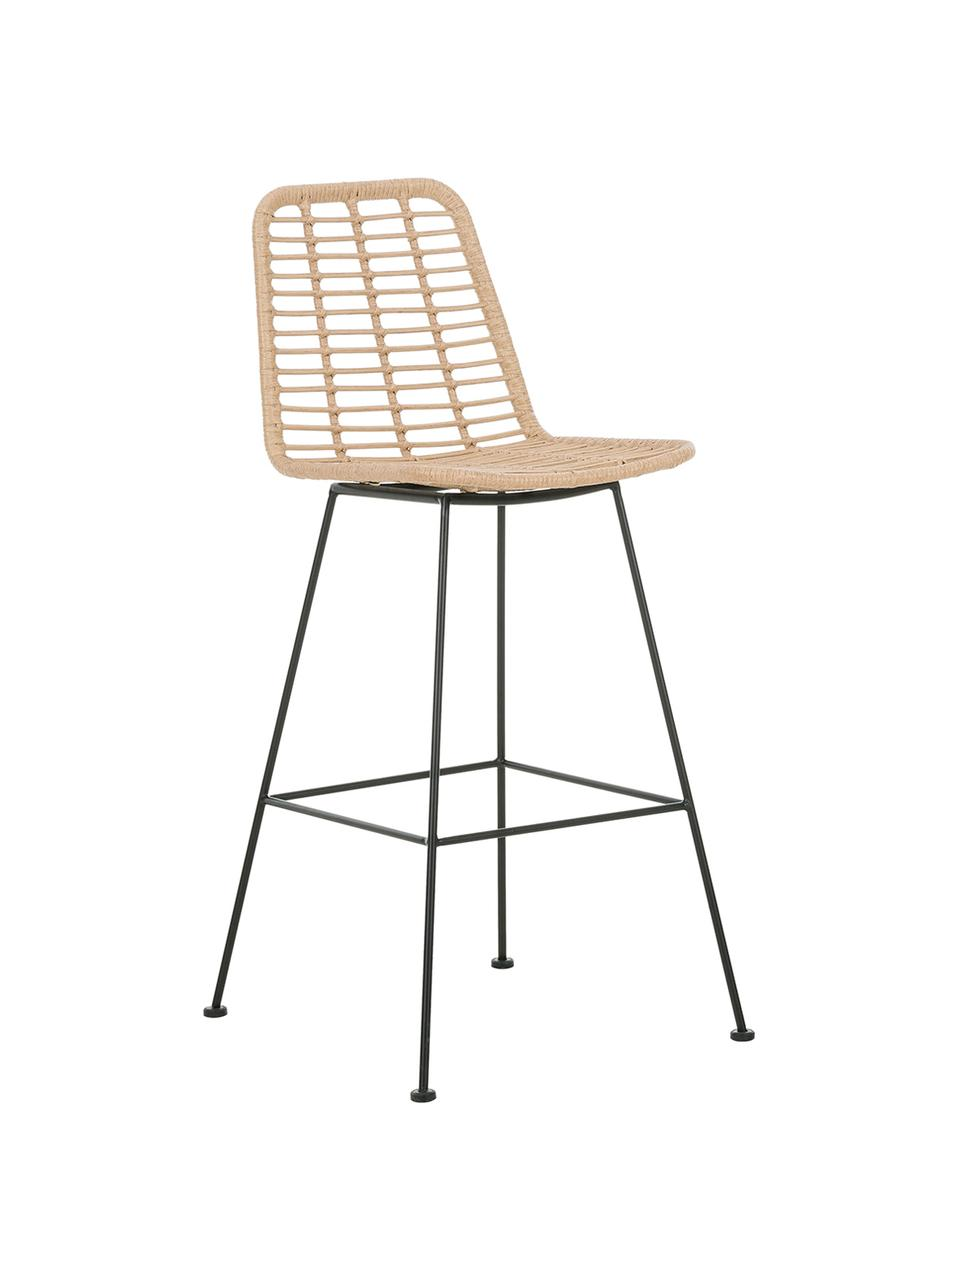 Polyrattan-Barstuhl Costa, Sitzfläche: Polyethylen-Geflecht, Gestell: Metall, pulverbeschichtet, Hellbraun, Schwarz, 56 x 98 cm